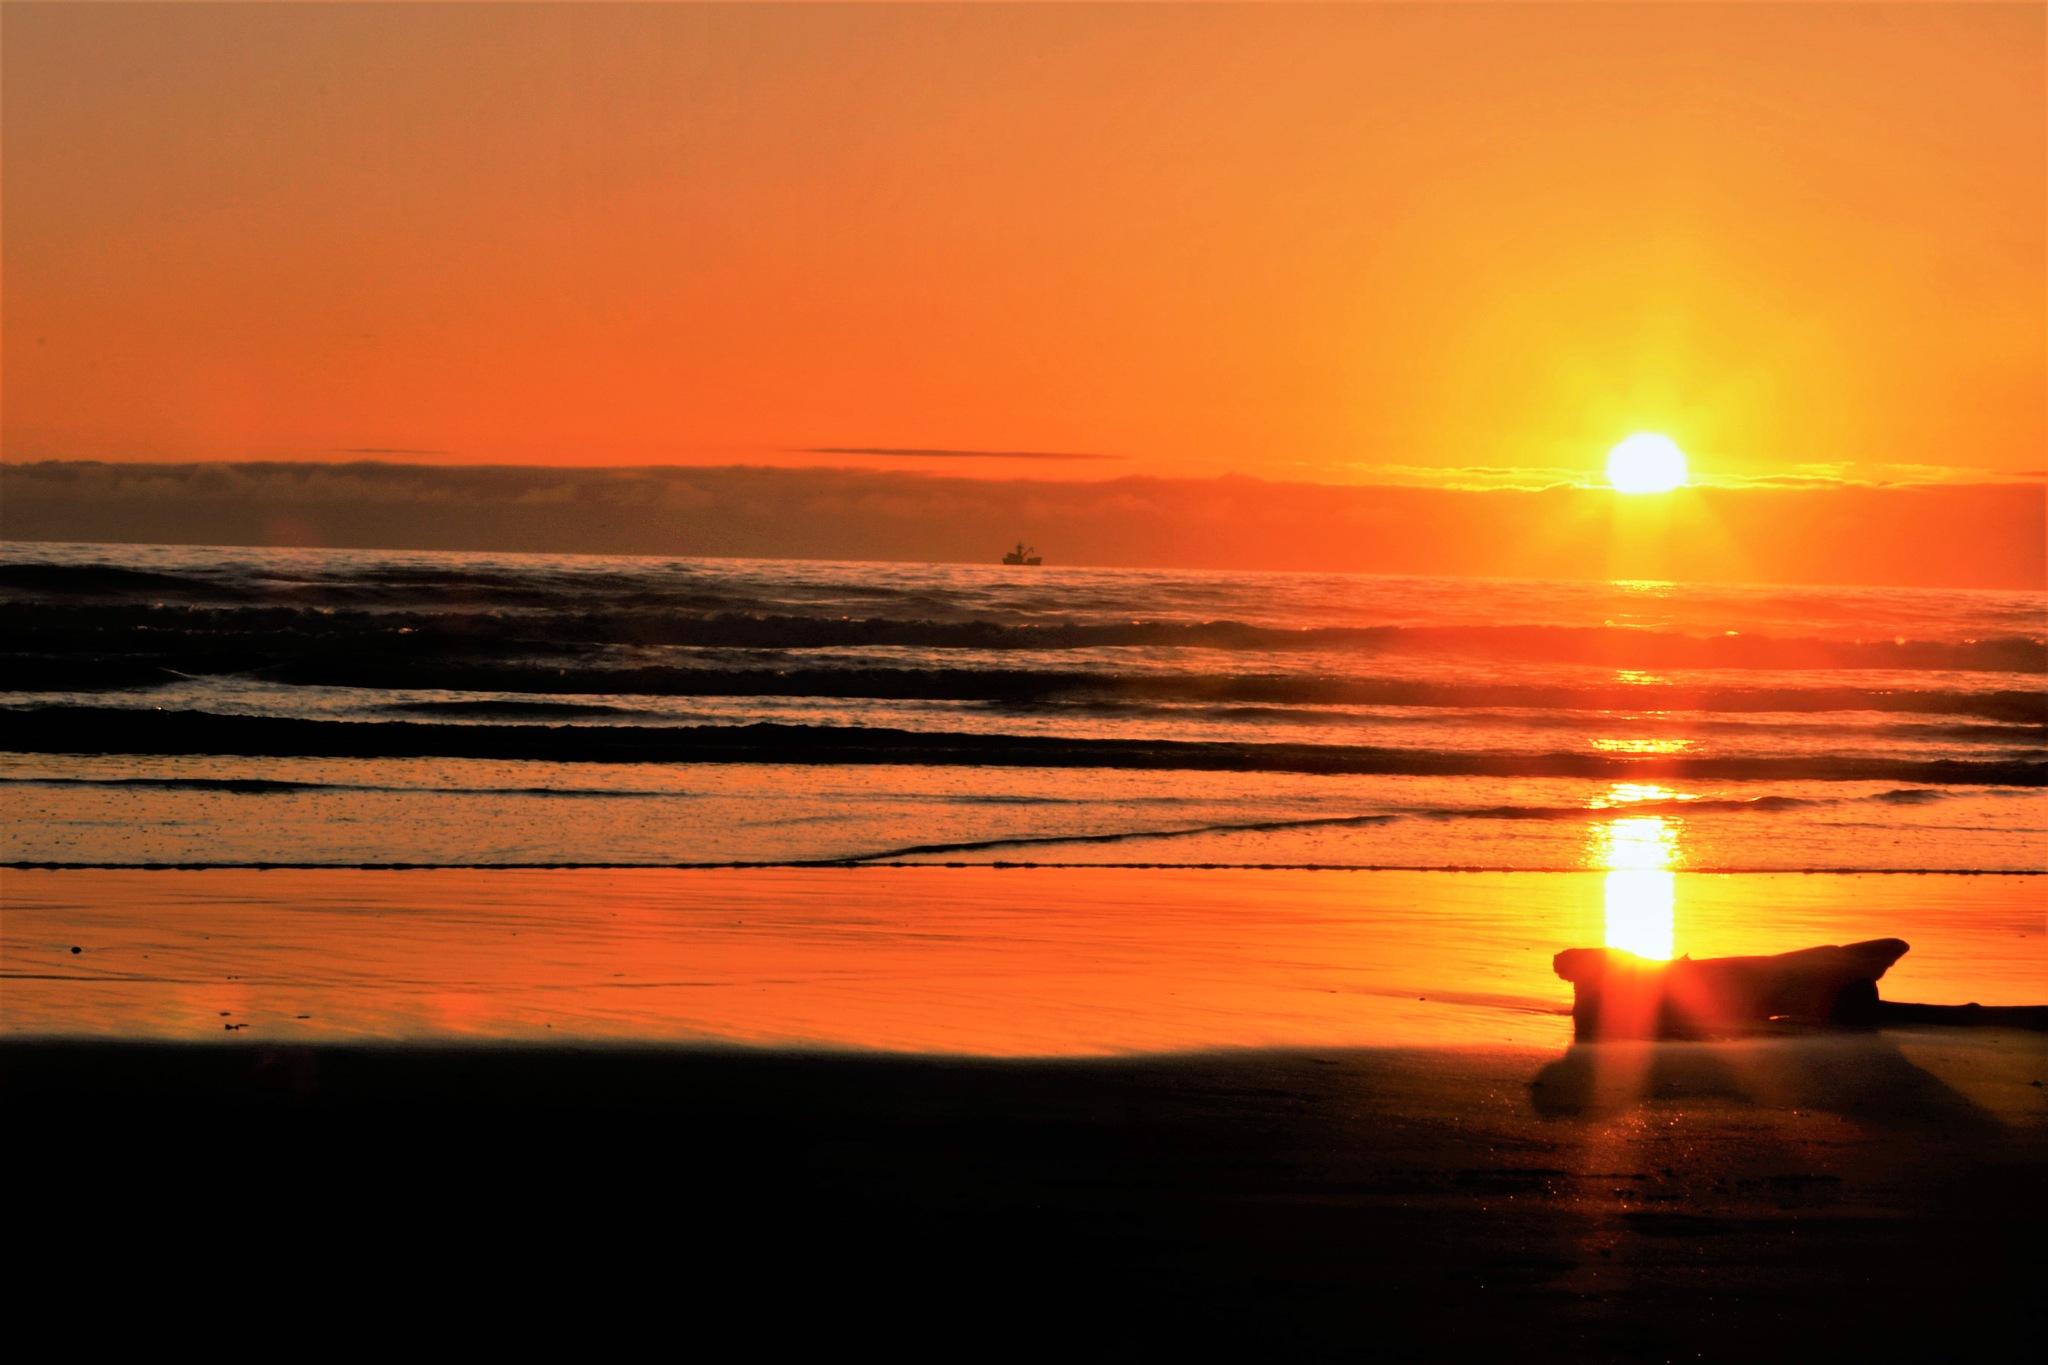 Nye Beach Golden Hour Sunset by Casey Bartel